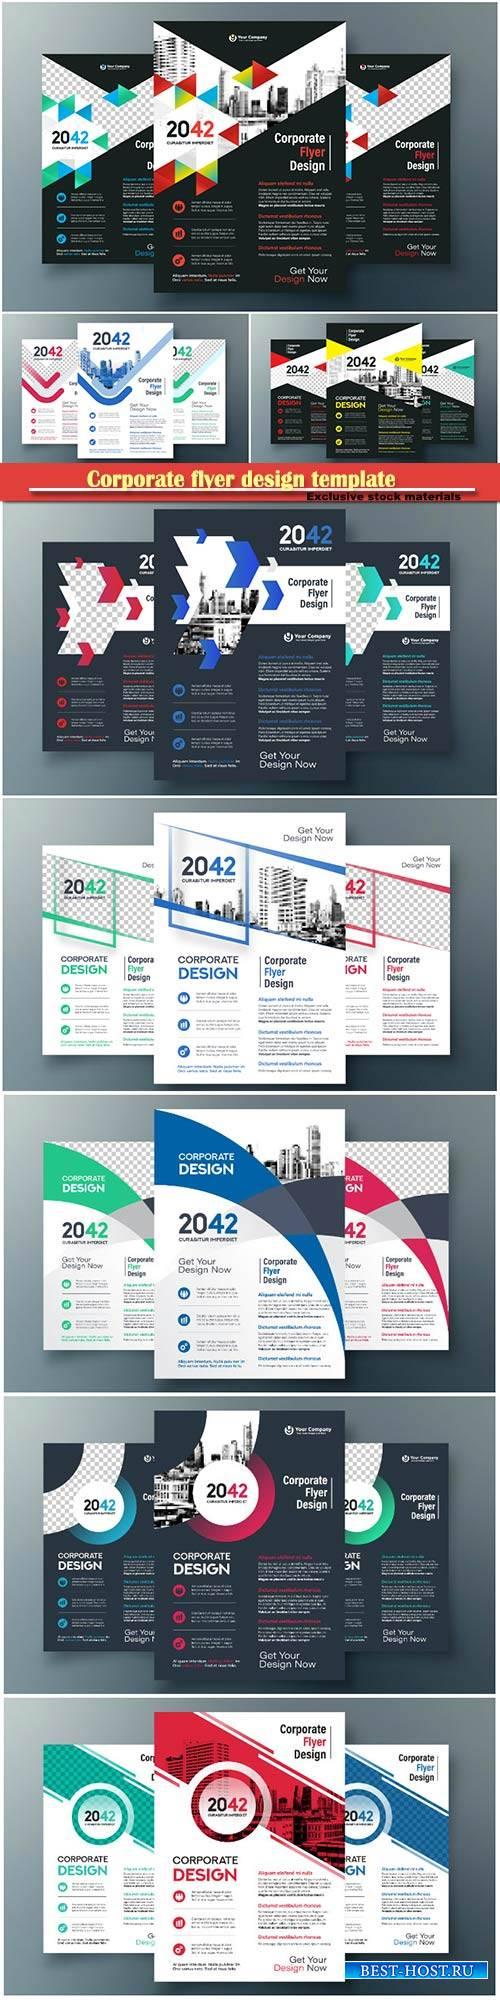 Corporate flyer design template, business vector design template